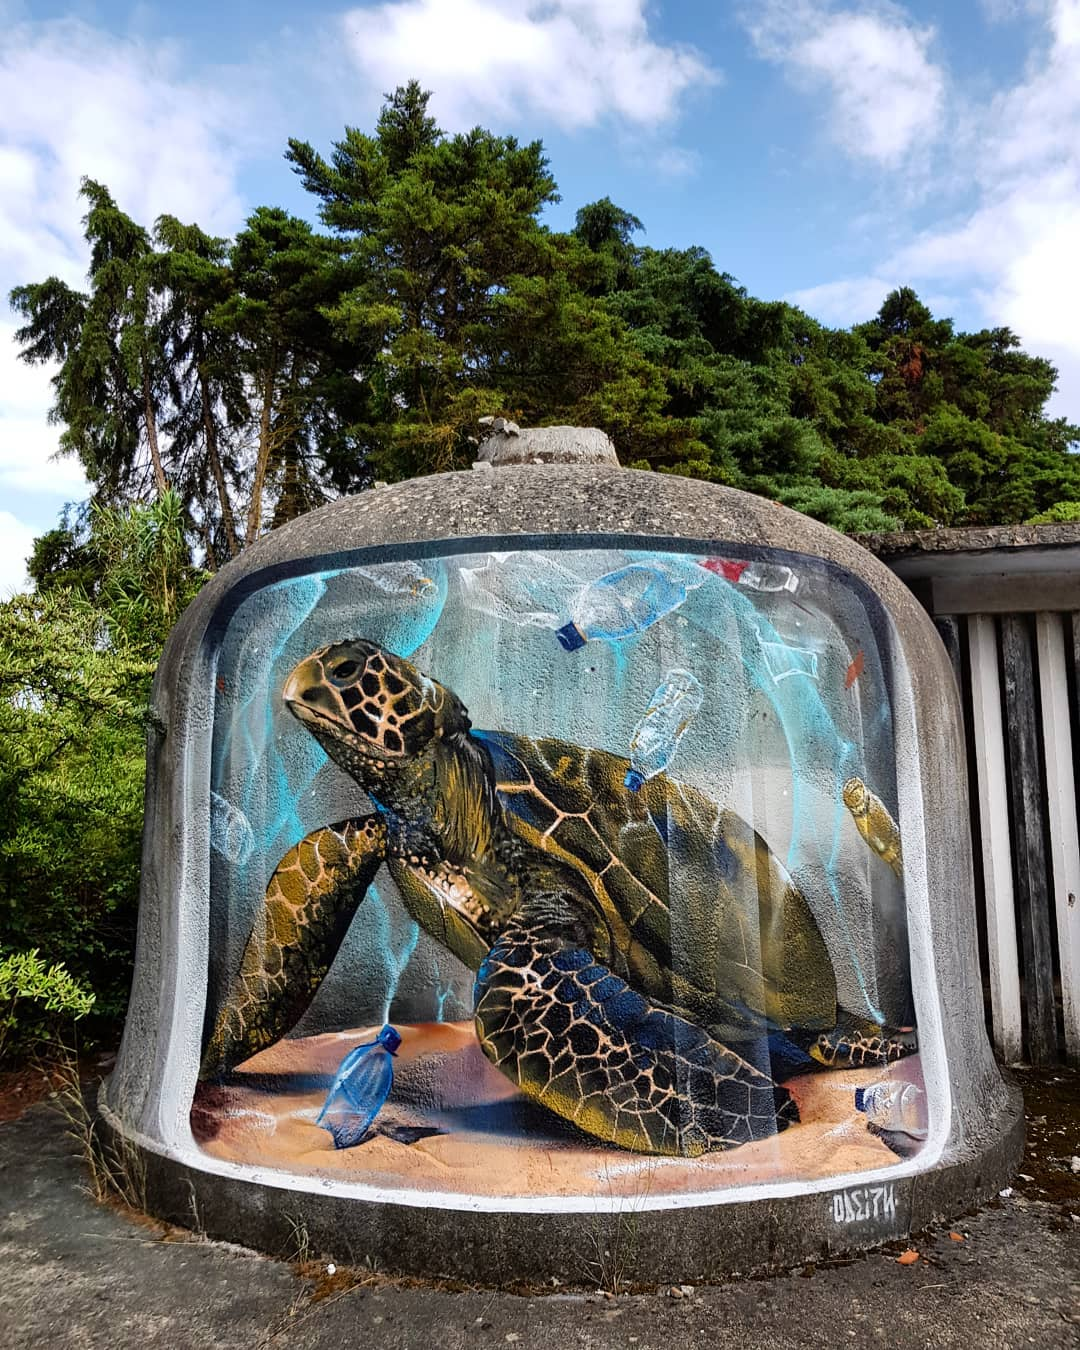 3d street art turtle by odeith